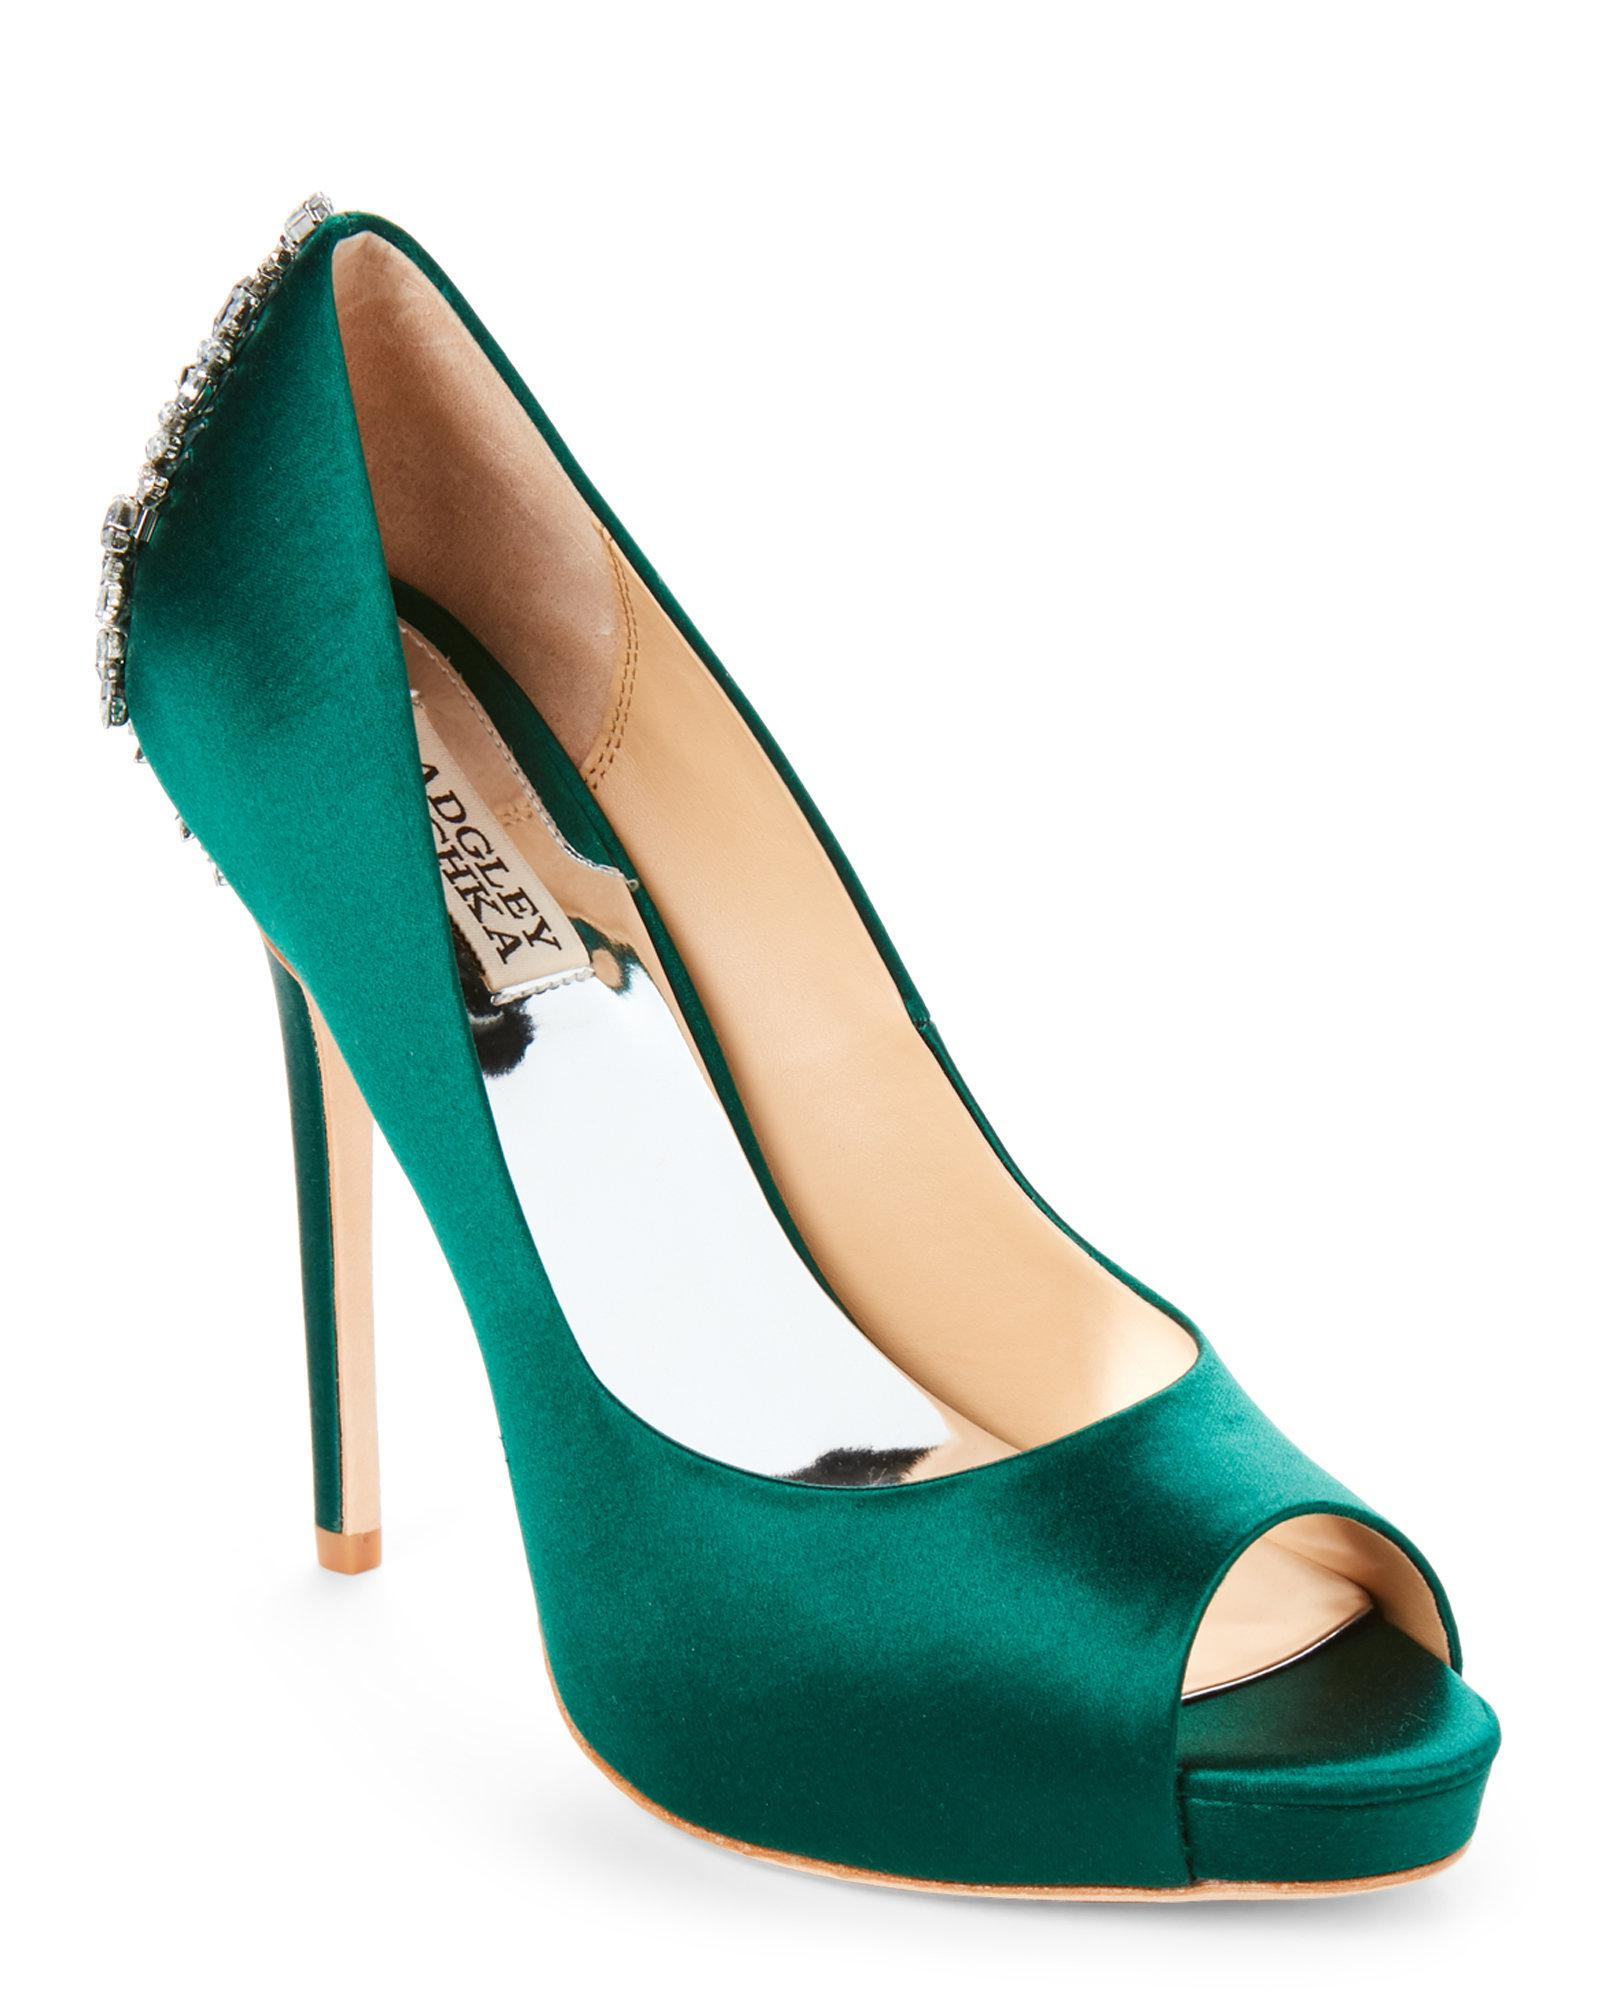 95cd30340e00 Lyst - Badgley Mischka Emerald Kiara Embellished Peep Toe Pumps in Green